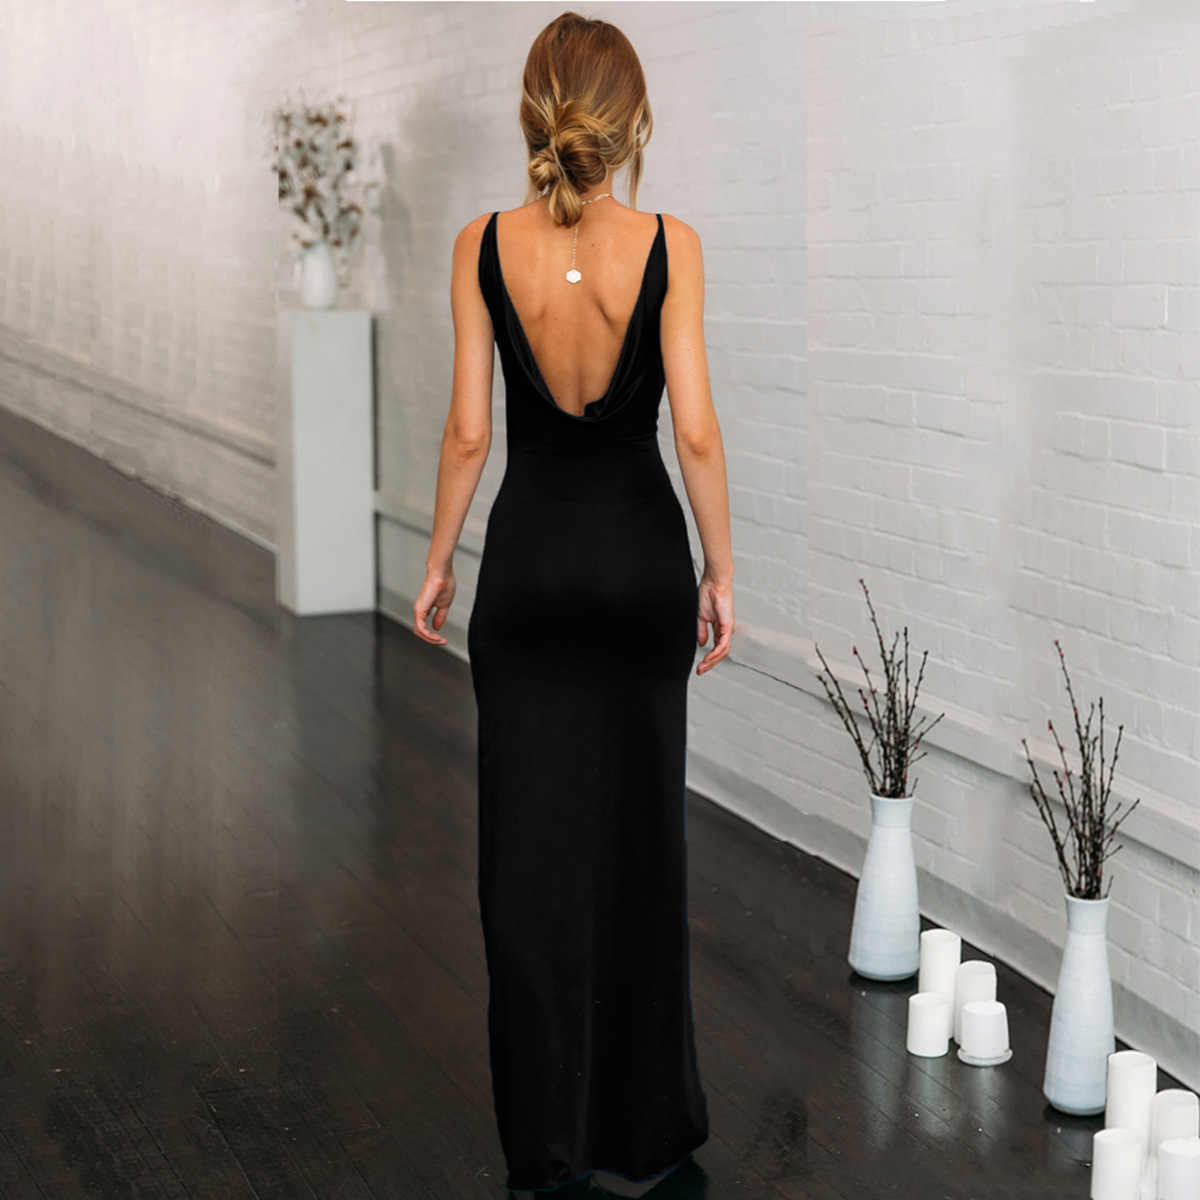 5974721496b7 ... Bangniweigou Sexy V Front Back Maxi Dress For Women Prom Party Side  Split Leg Open Slip ...